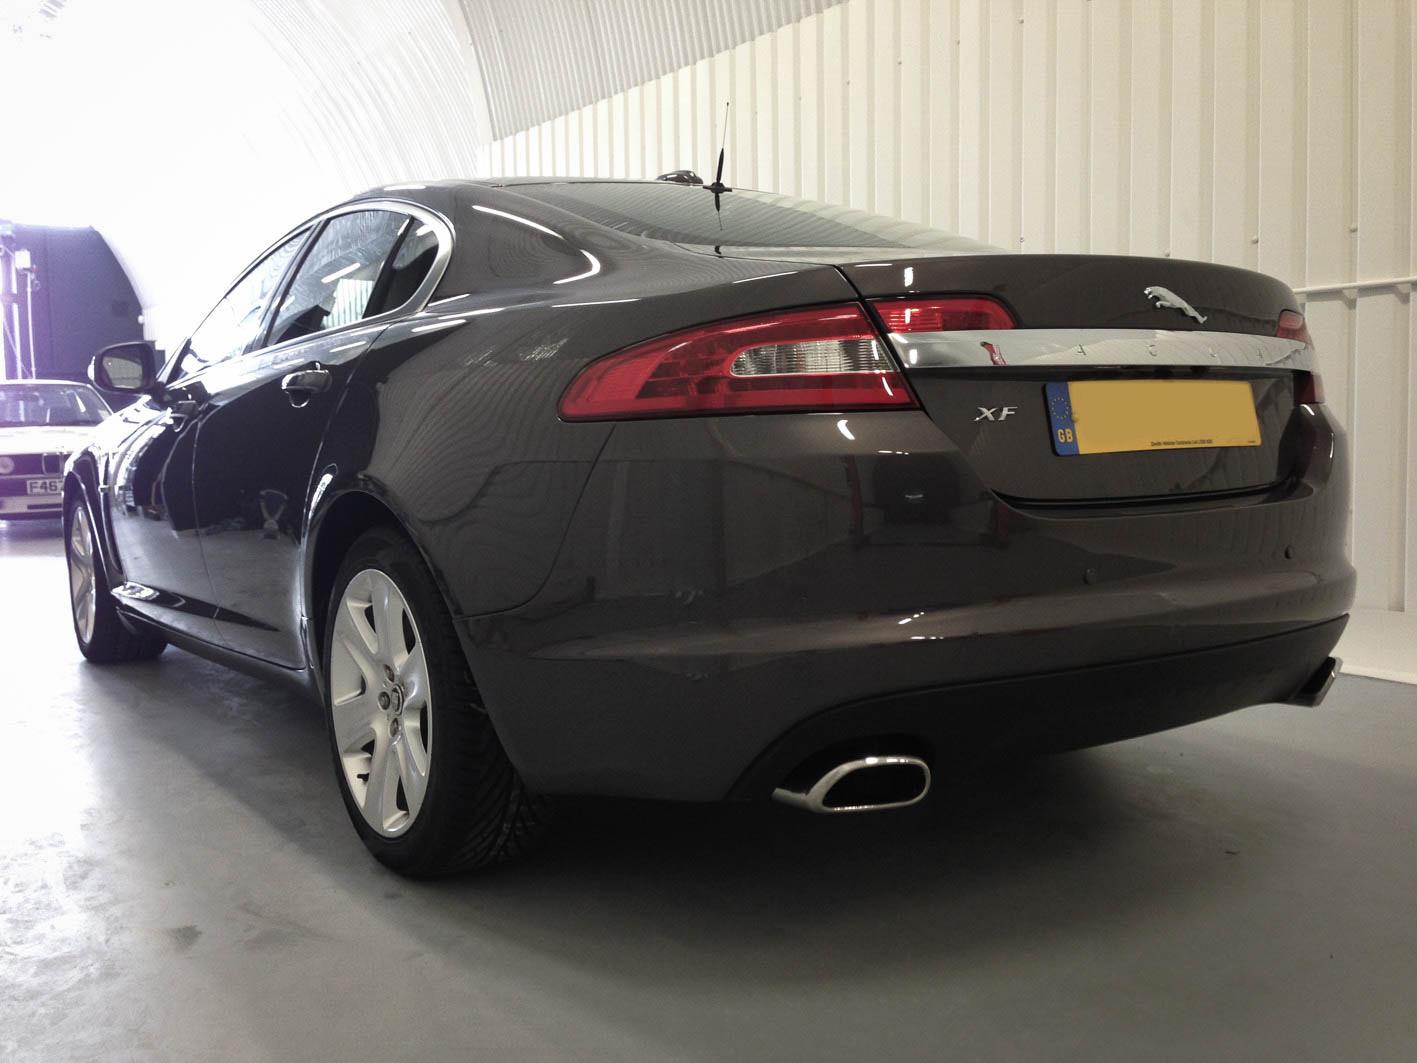 Jaguar XF – Rear